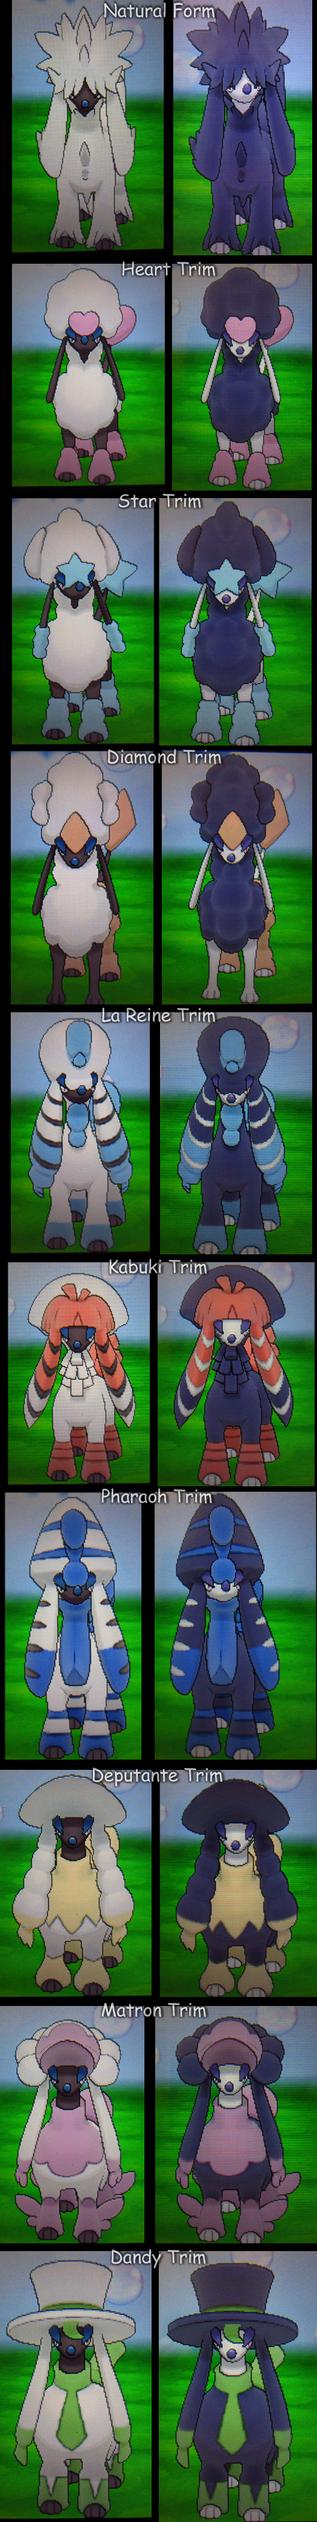 Pokemon XY - All Furfrou Trims! (Normal + Shiny) by Sapphiresenthiss on DeviantArt